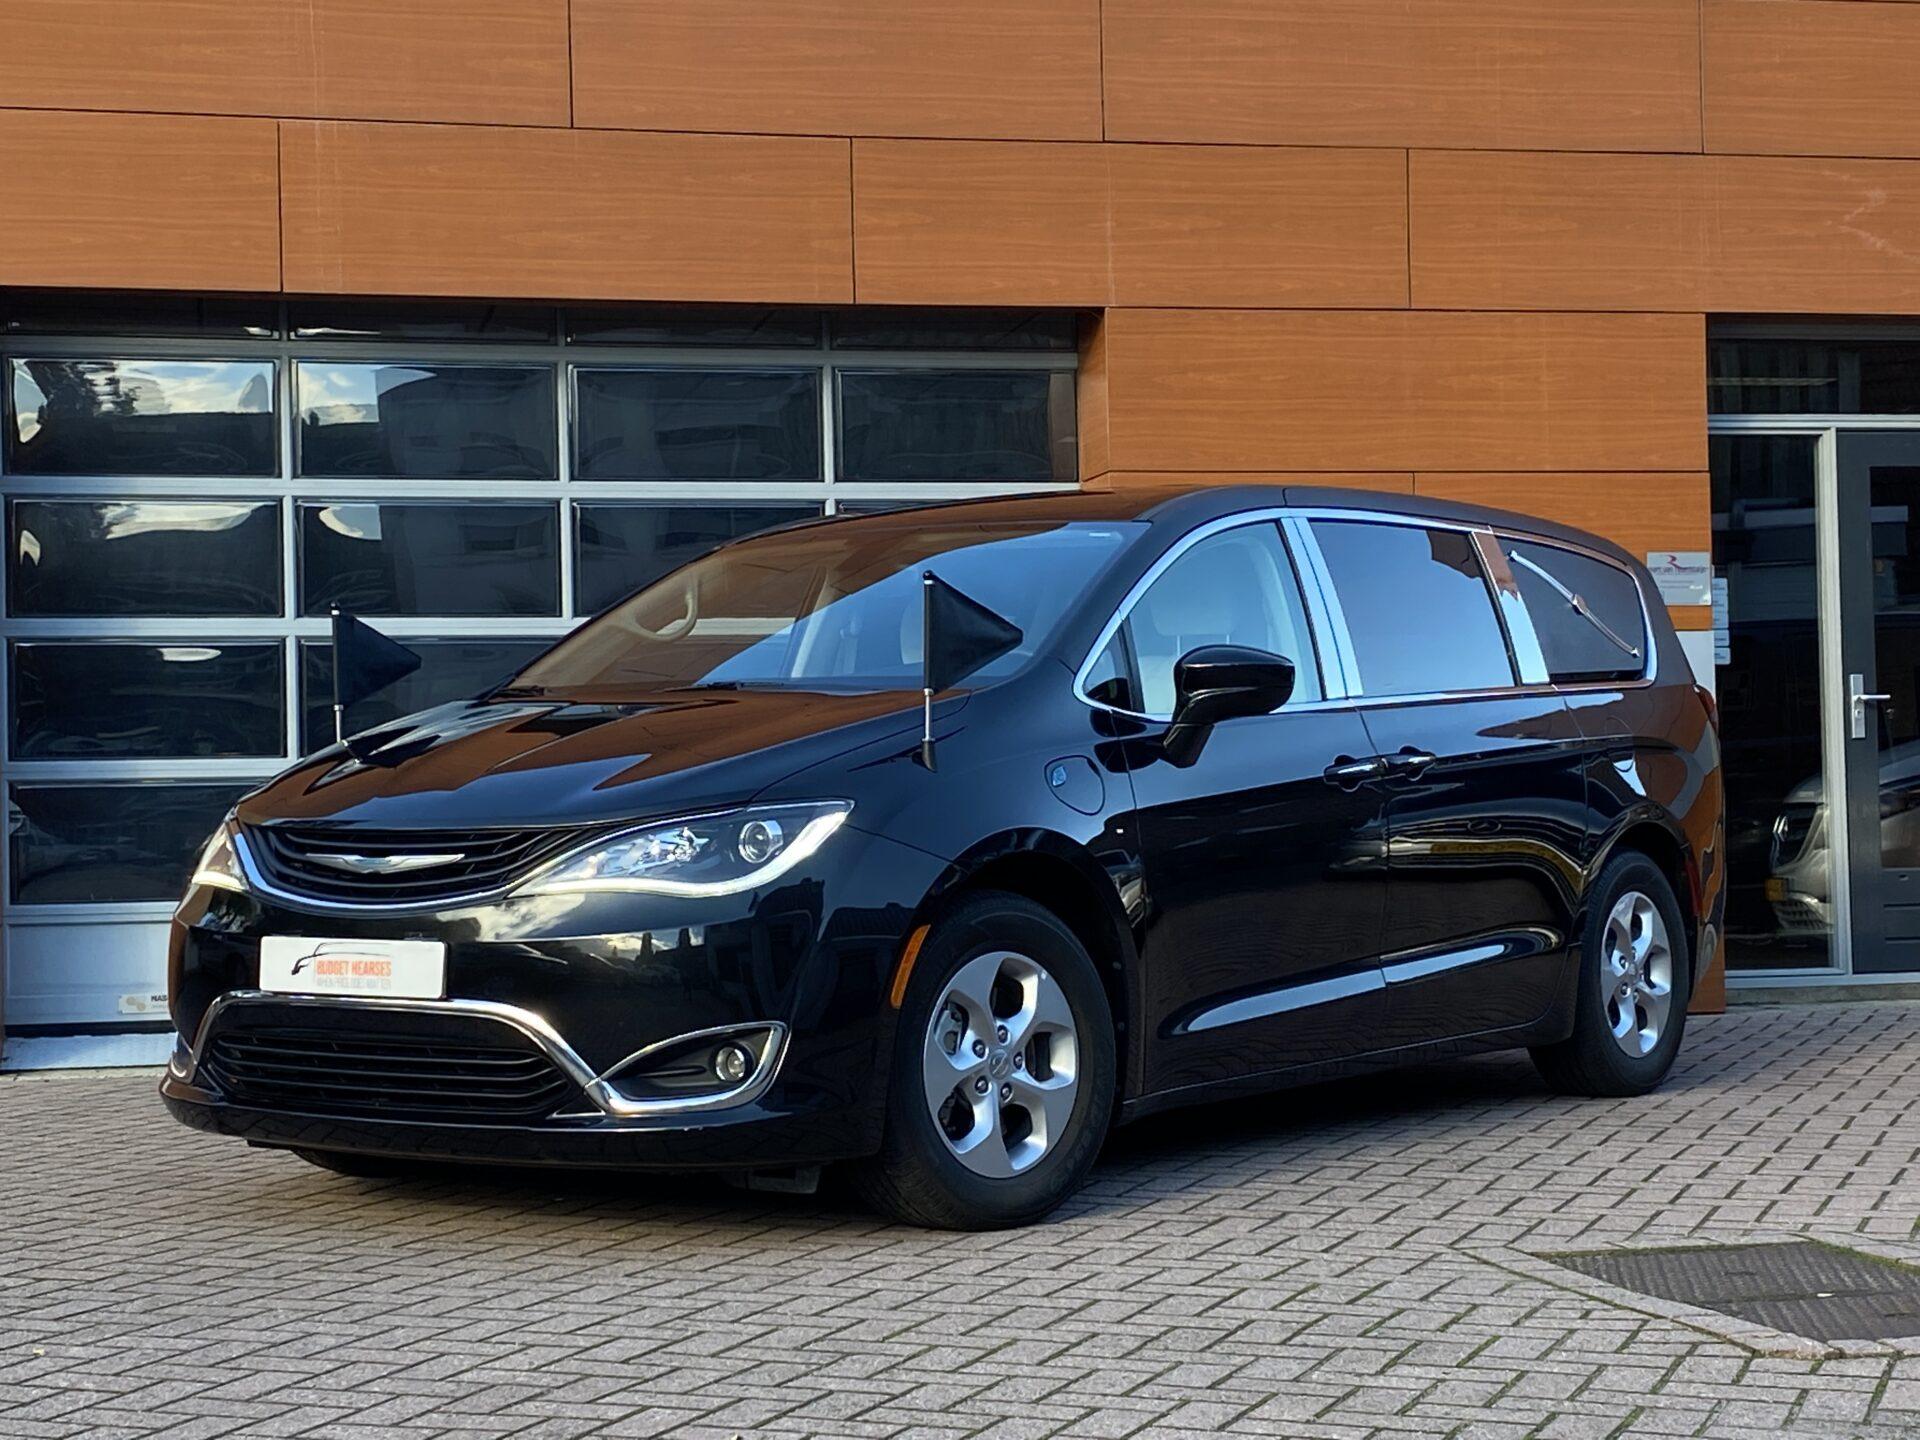 Chrysler Pacifica Hybride Multi-Hearse